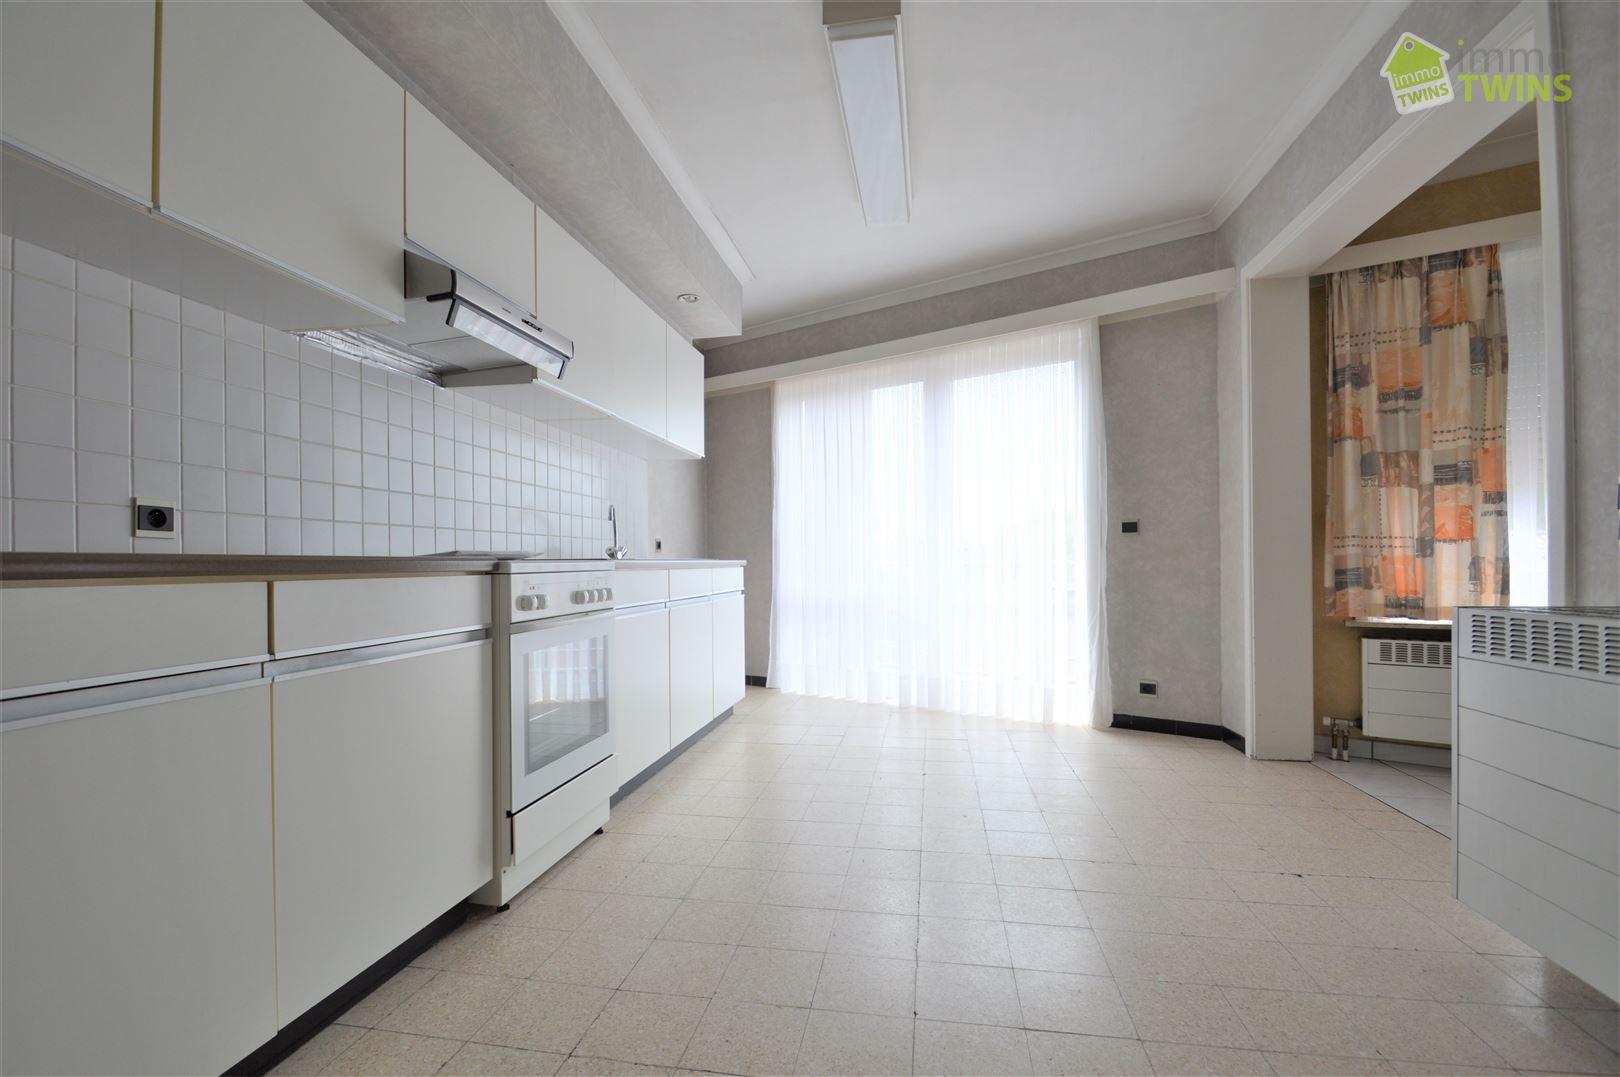 Foto 4 : Appartement te 9280 LEBBEKE (België) - Prijs € 625